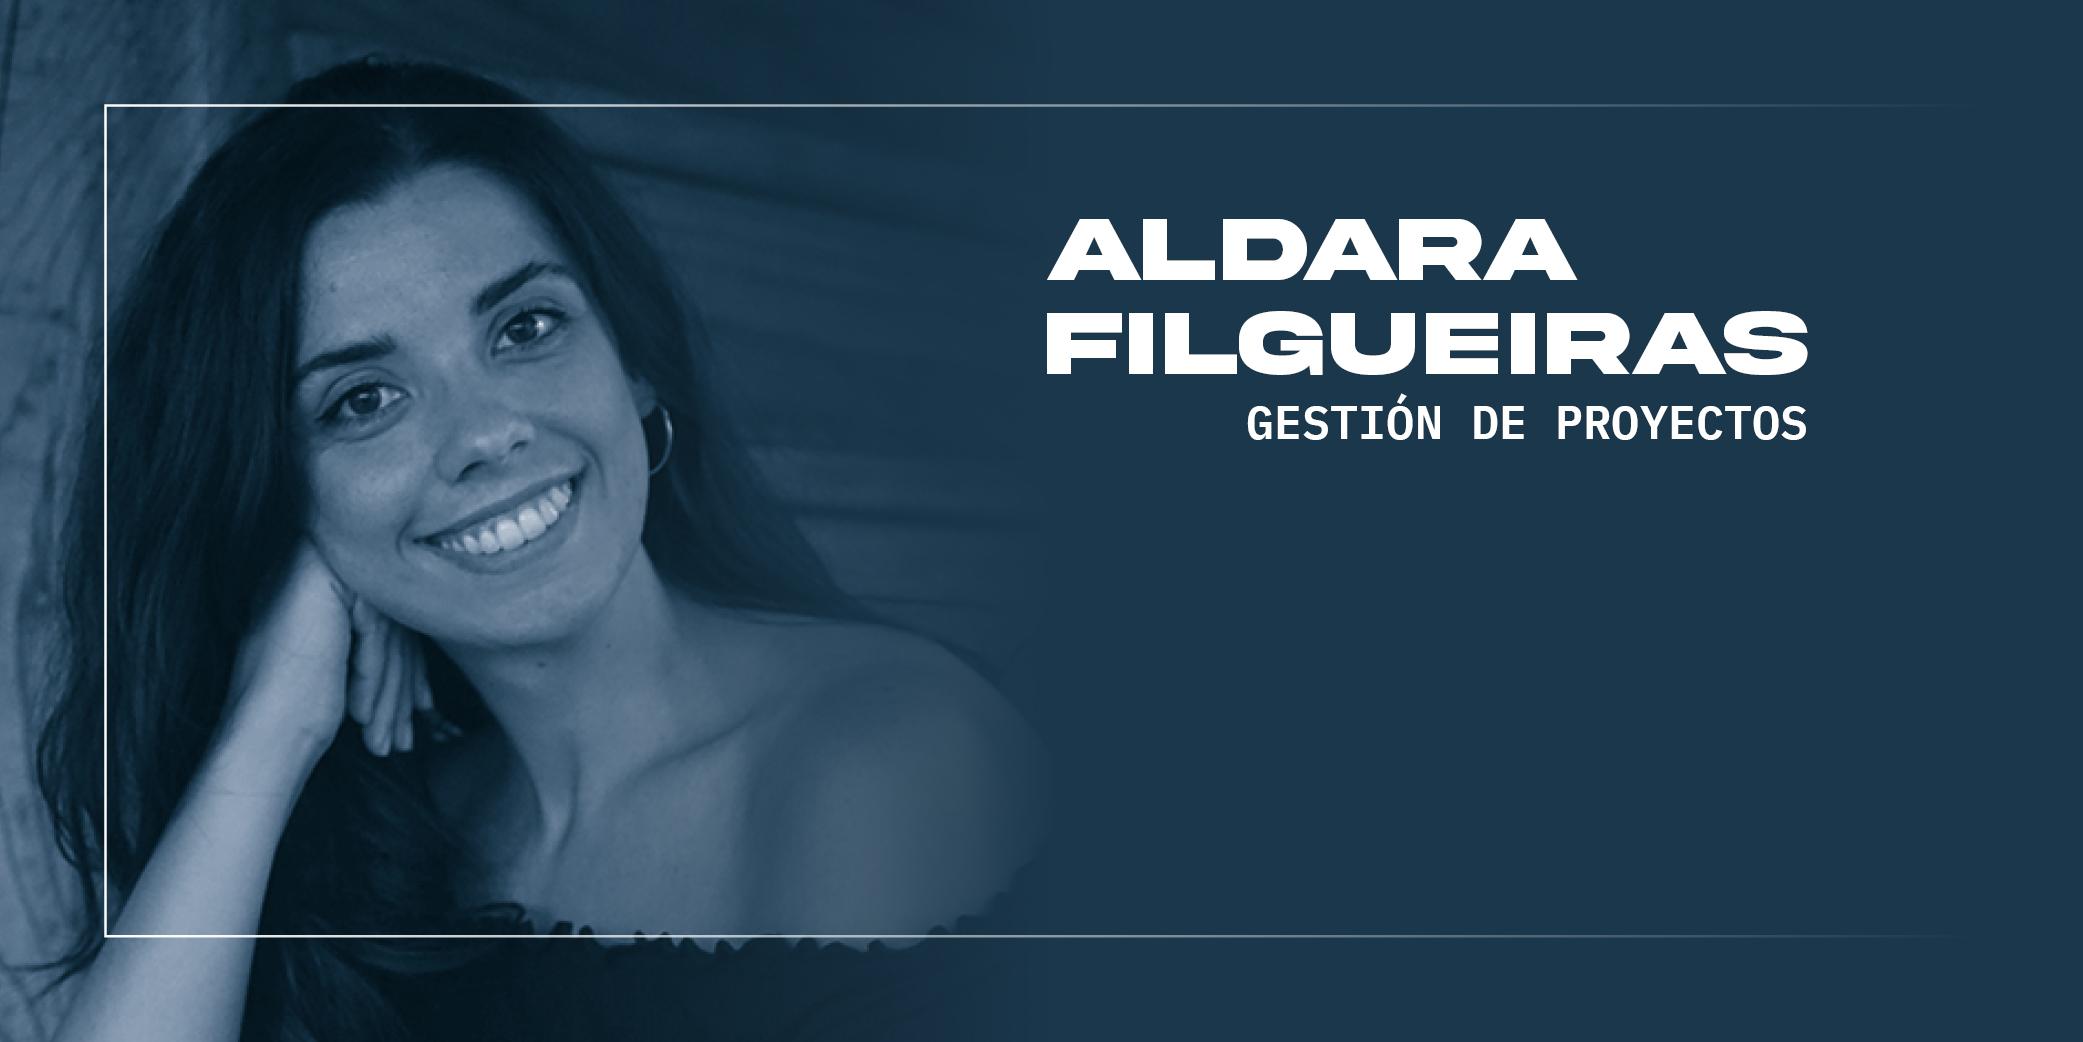 presentacion igata Aldara Filgueiras